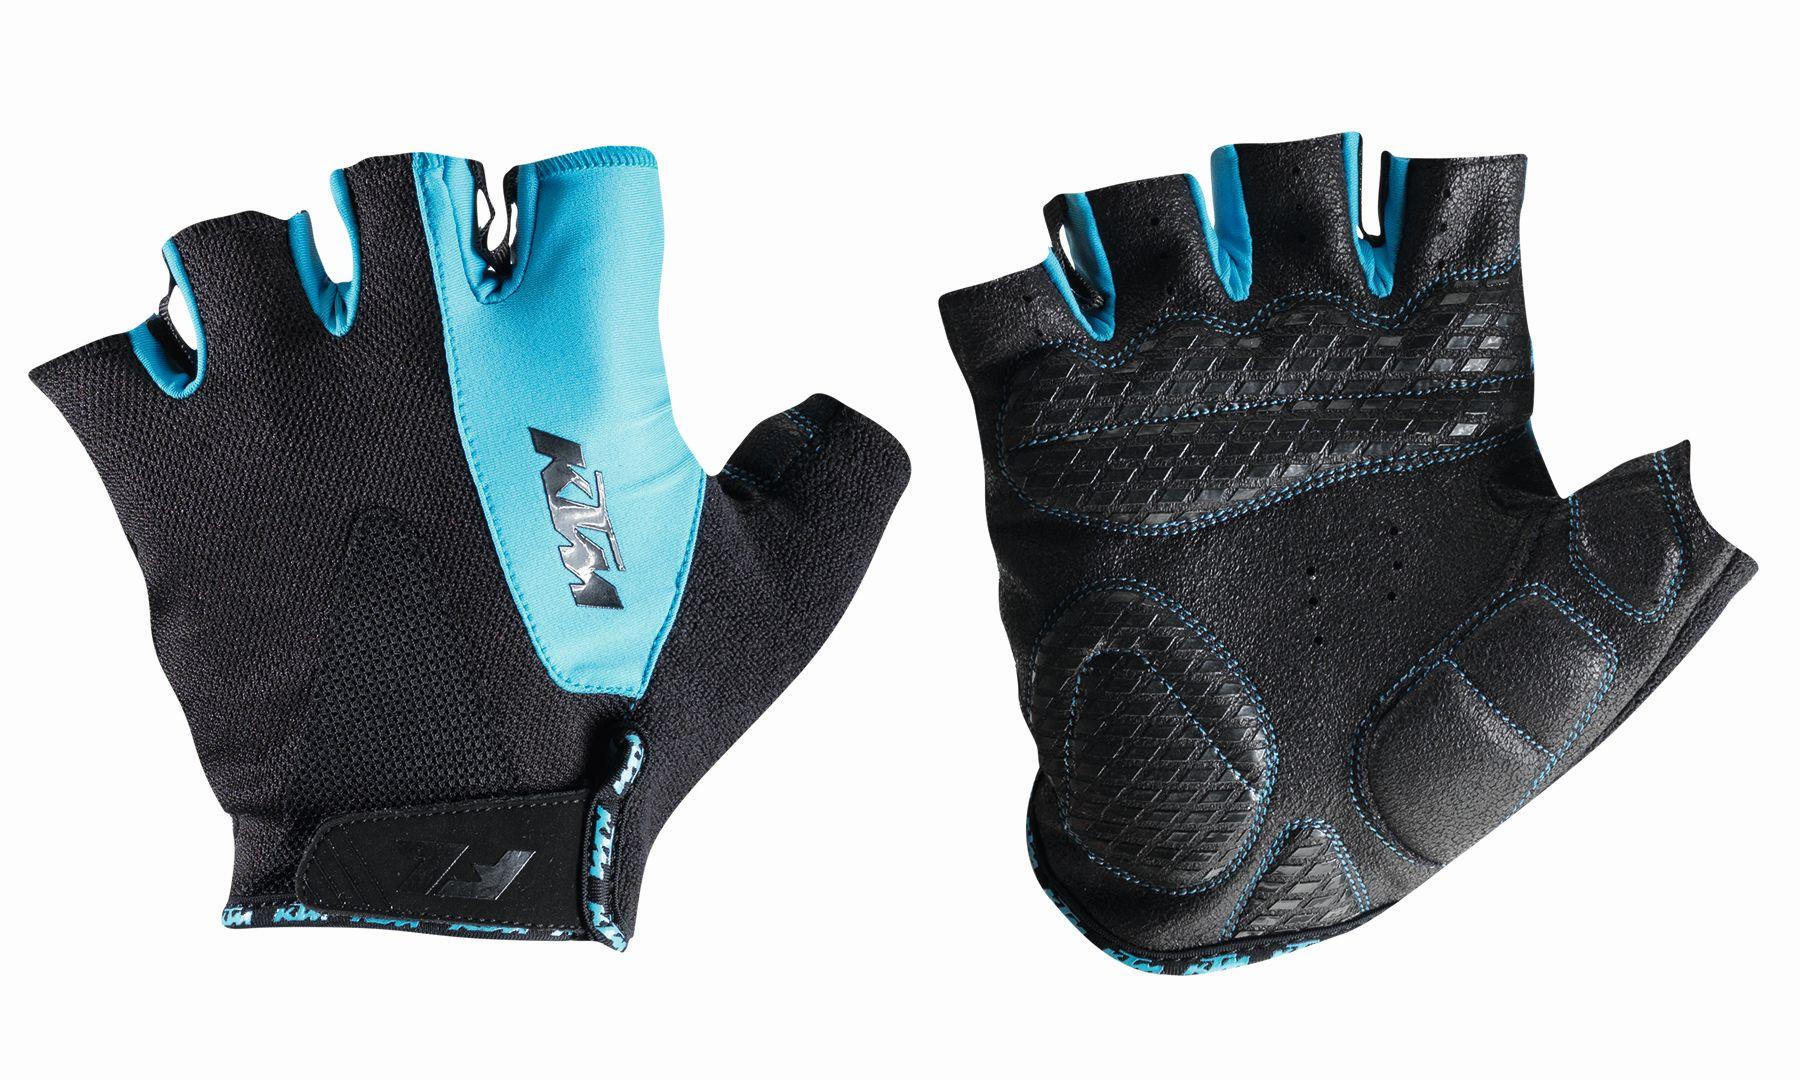 KTM Factory Line Handschuhe, kurz